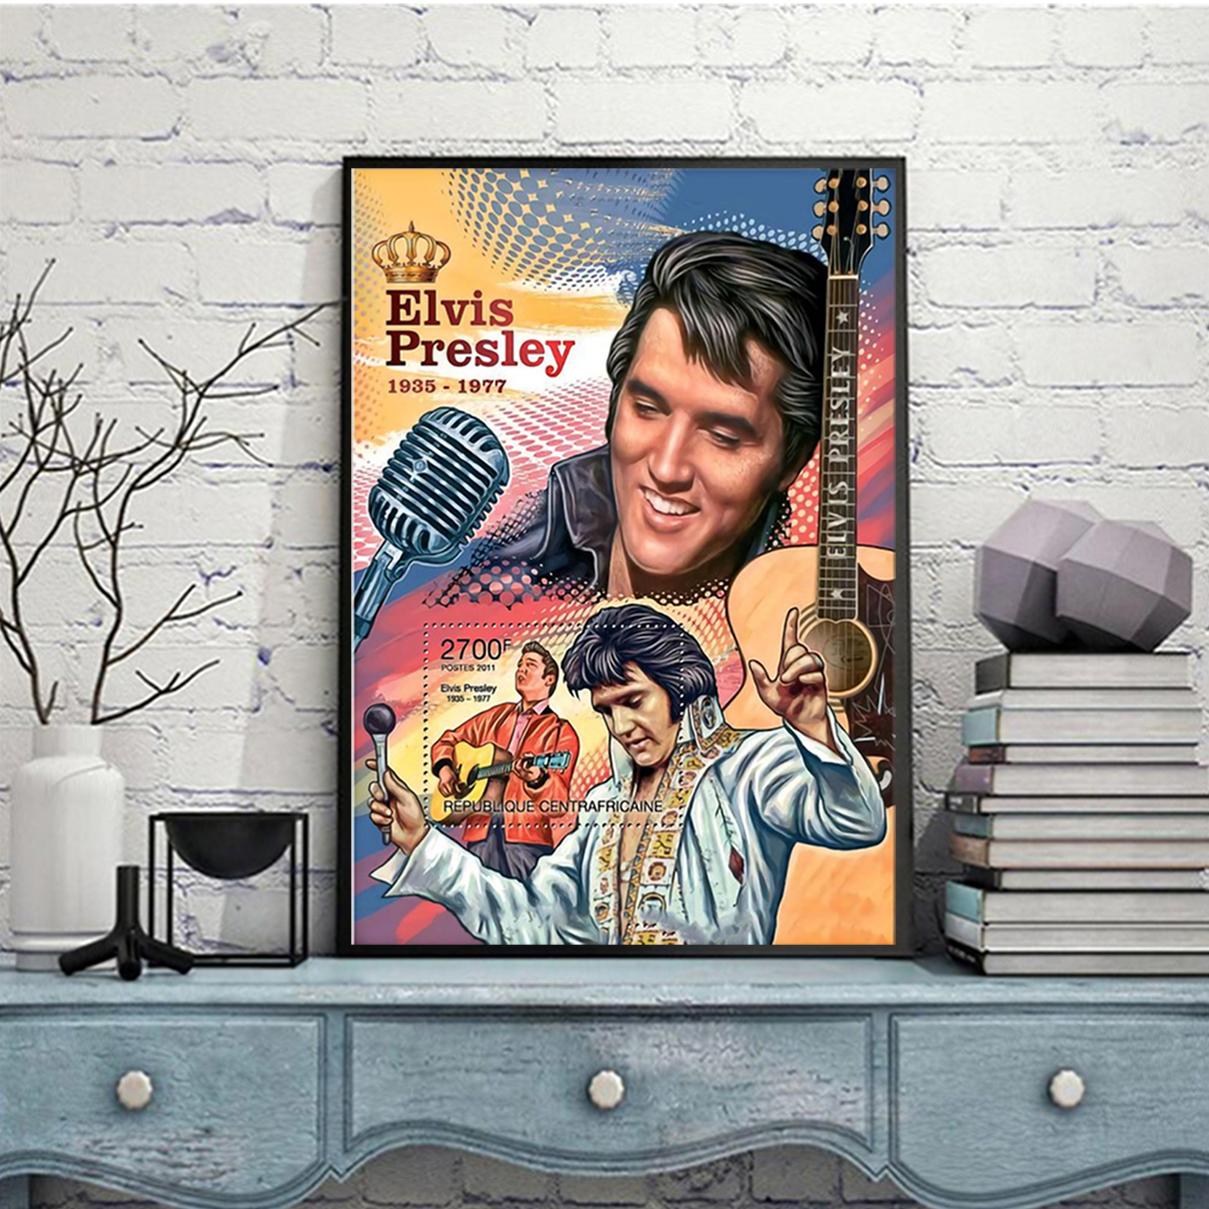 Evis presley king of RnR poster A1